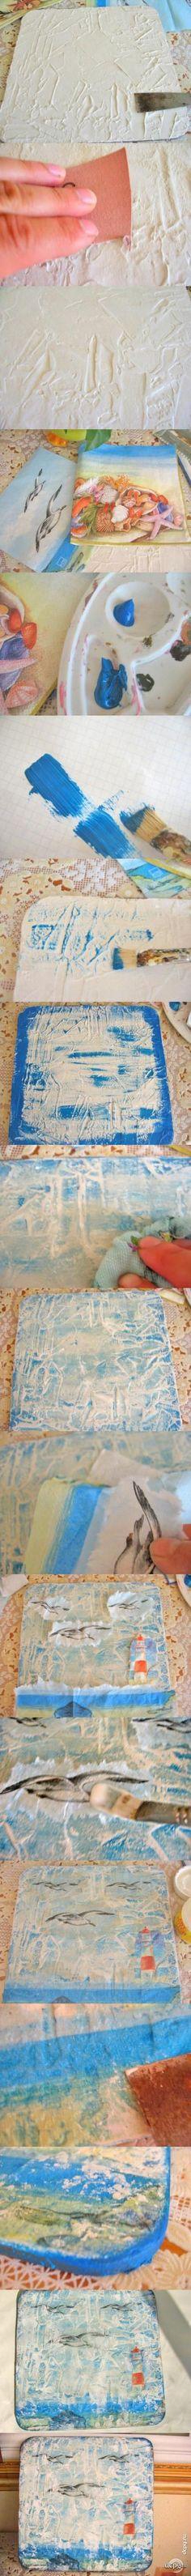 Декупаж - Сайт любителей декупажа - DCPG.RU | Декупаж по шпатлевке Click on photo to see more! Нажмите на фото чтобы увидеть больше!  decoupage art craft handmade home decor DIY do it yourself tutorial